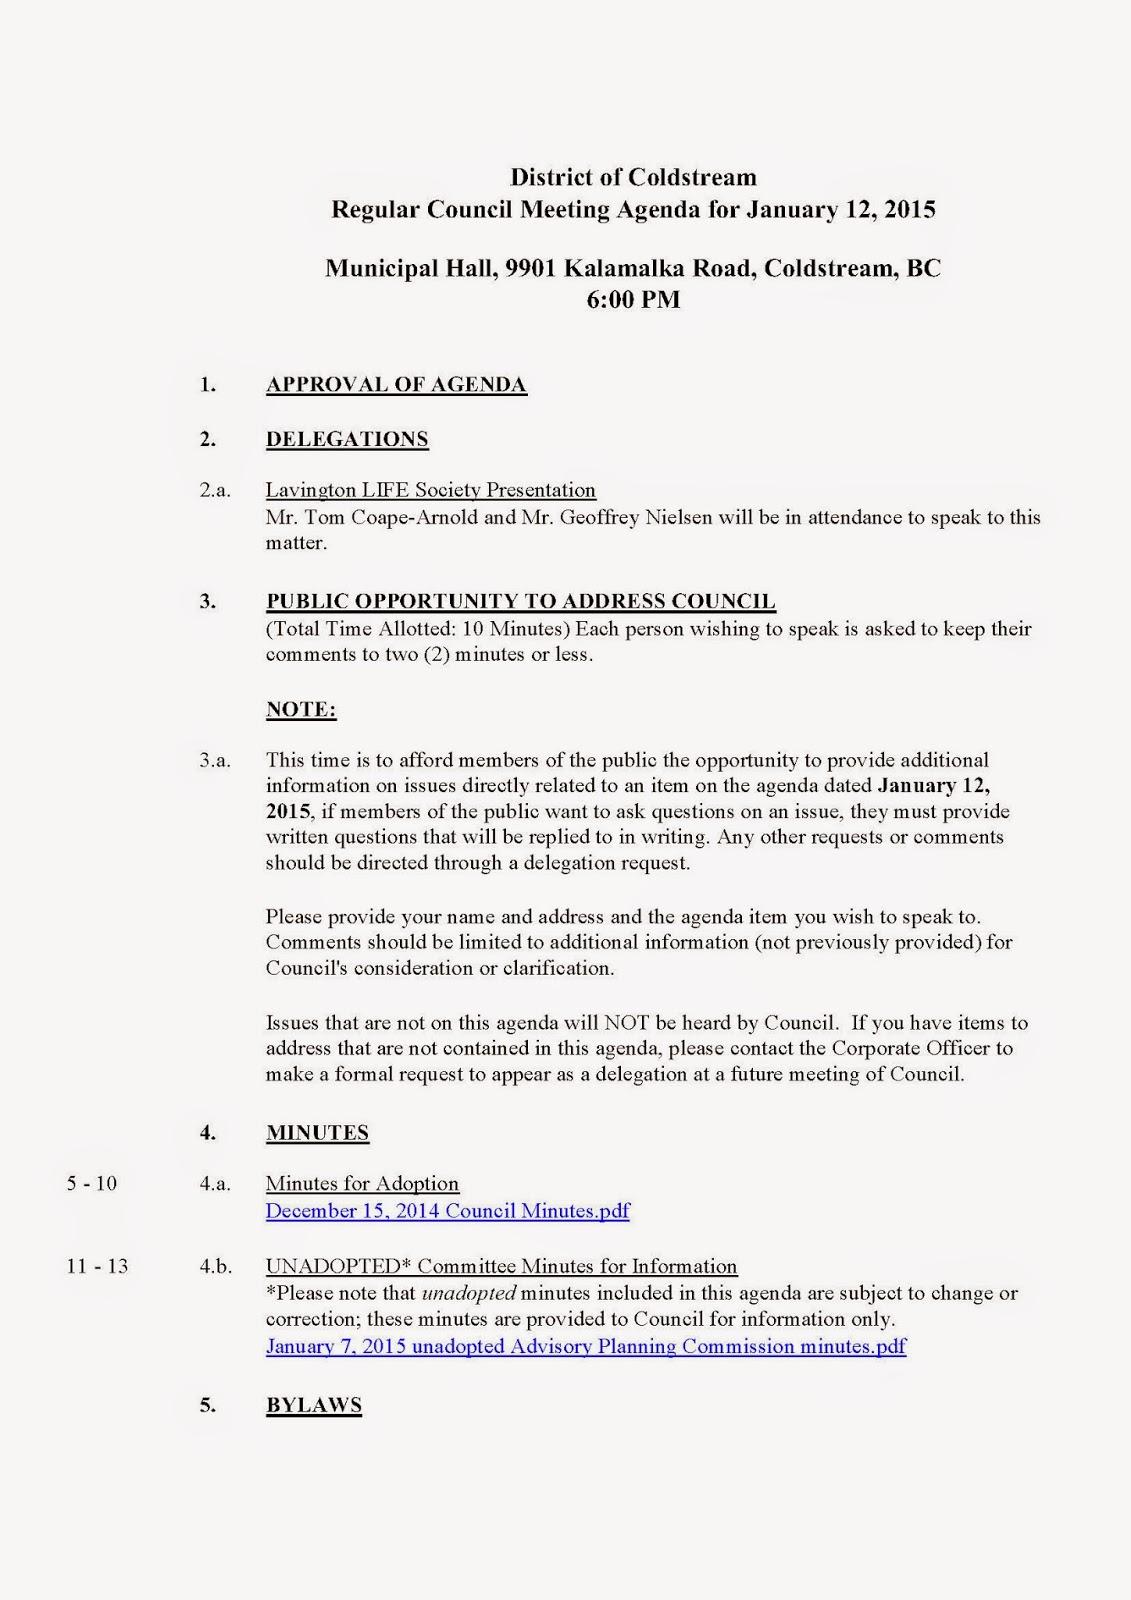 http://coldstream.civicweb.net/Documents/DocumentList.aspx?ID=19448